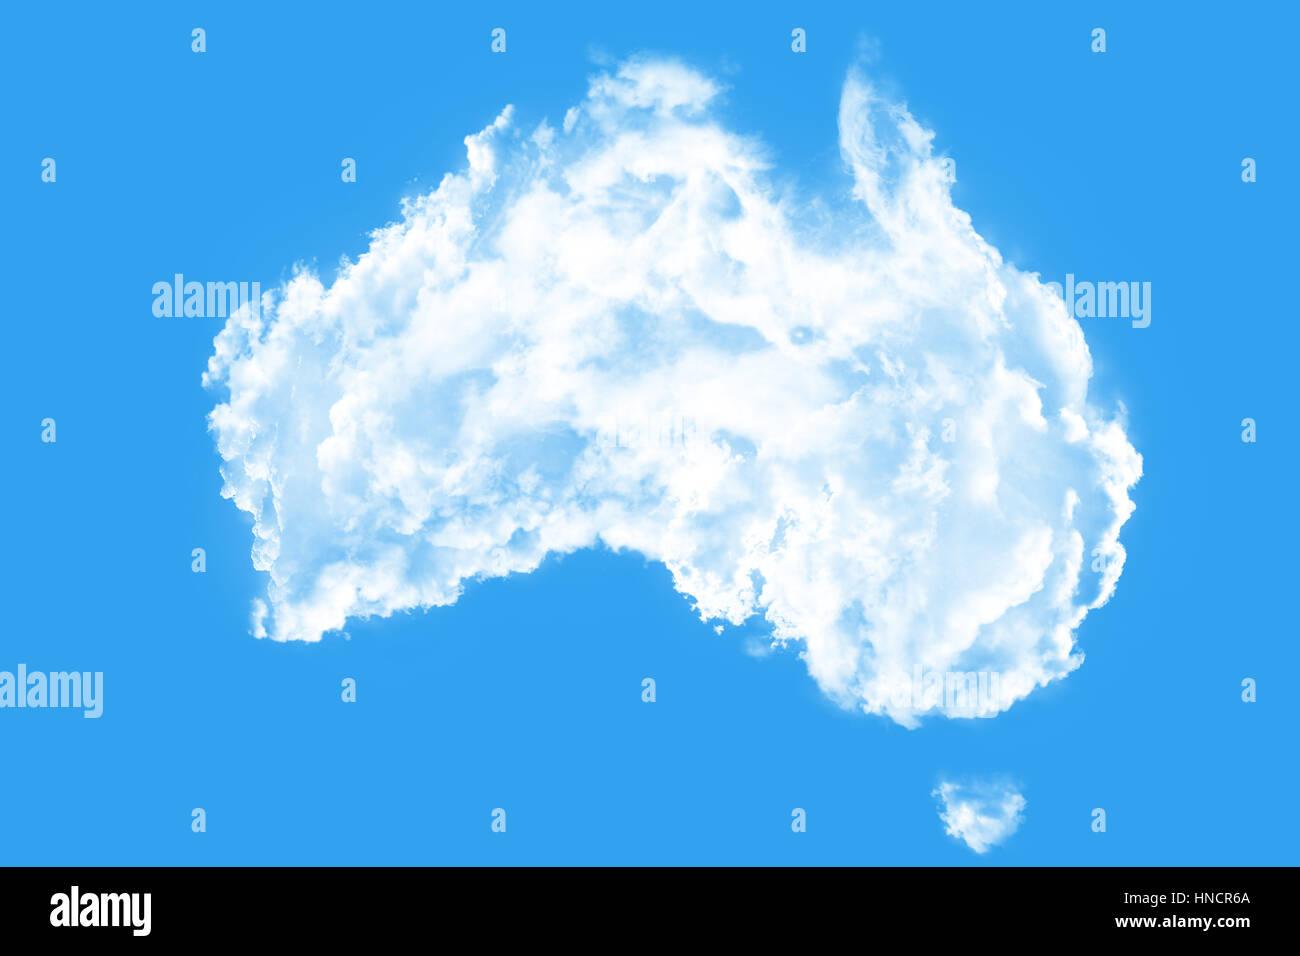 Australia Map Shape.Australia Map Shape Clouds Stock Photo 133661986 Alamy